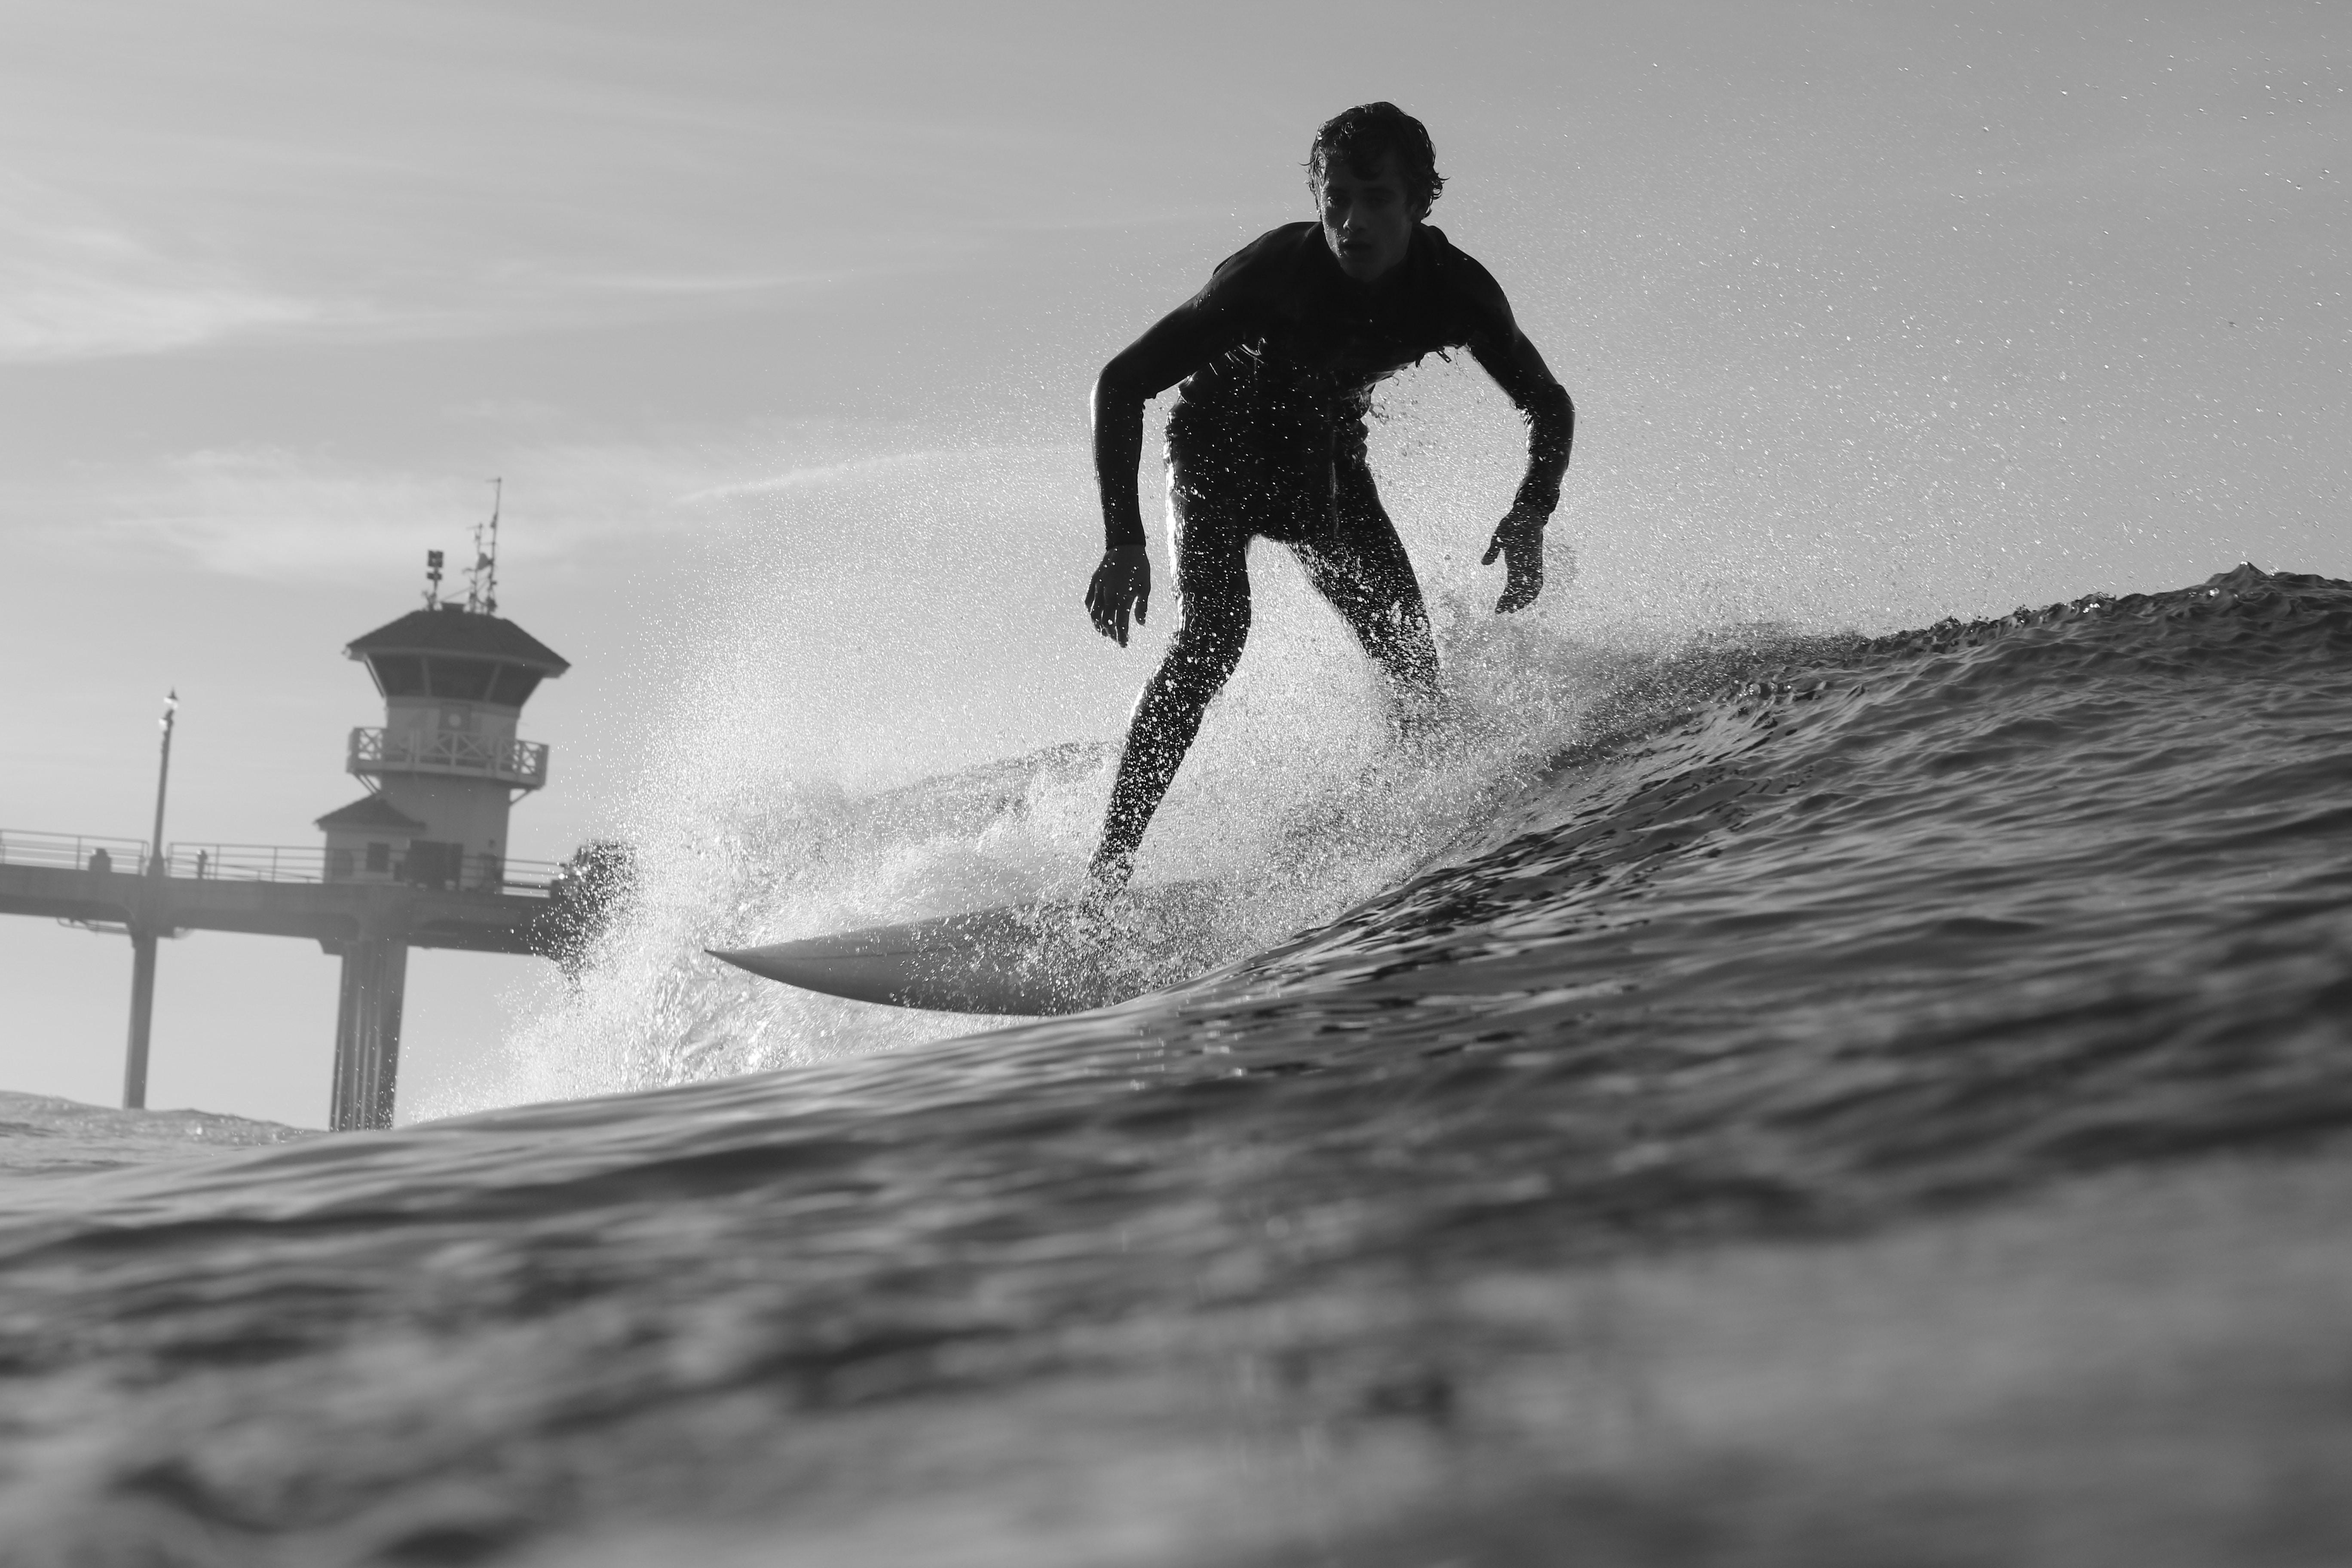 man surfing under gray sky